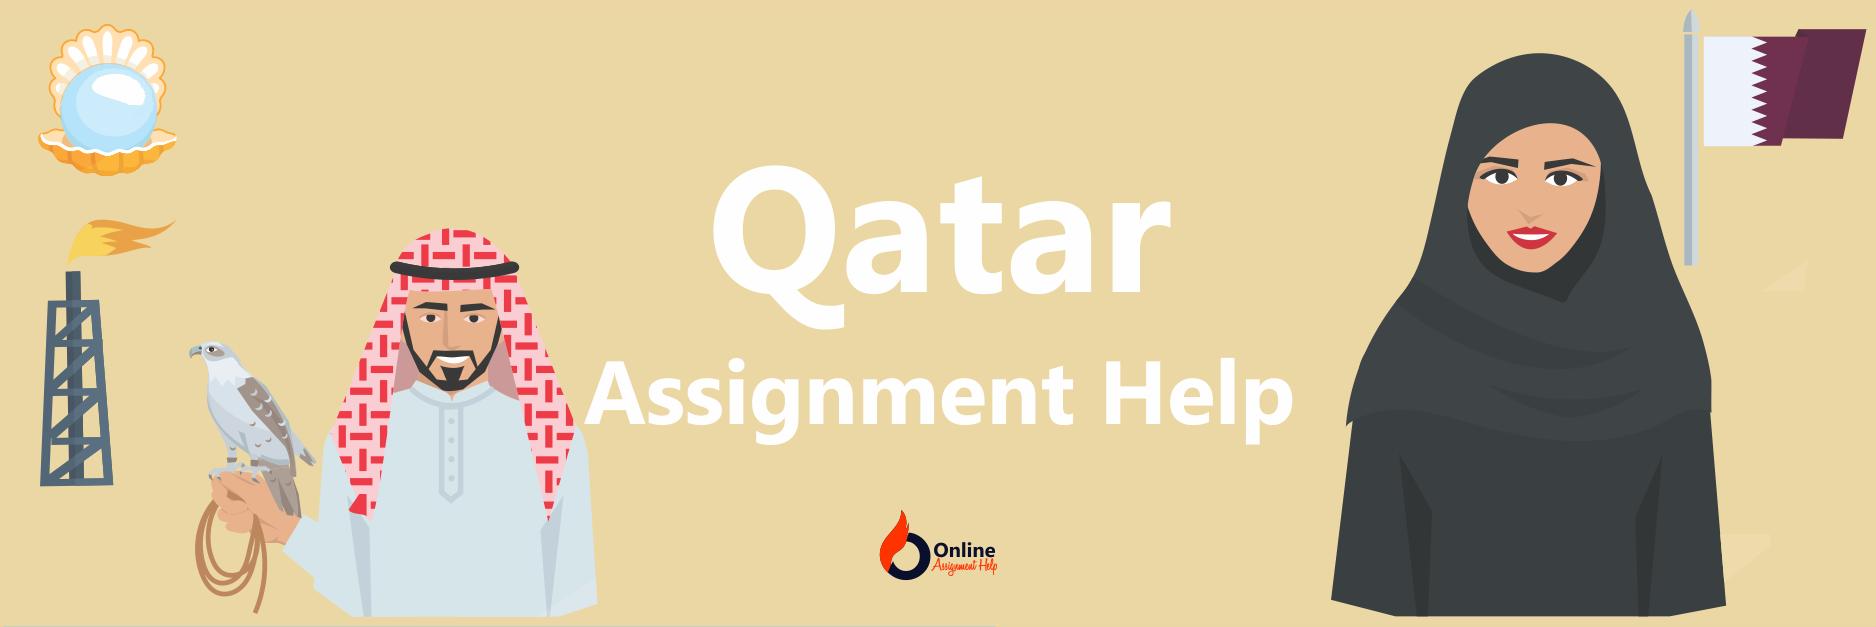 Assignment Help Qatar